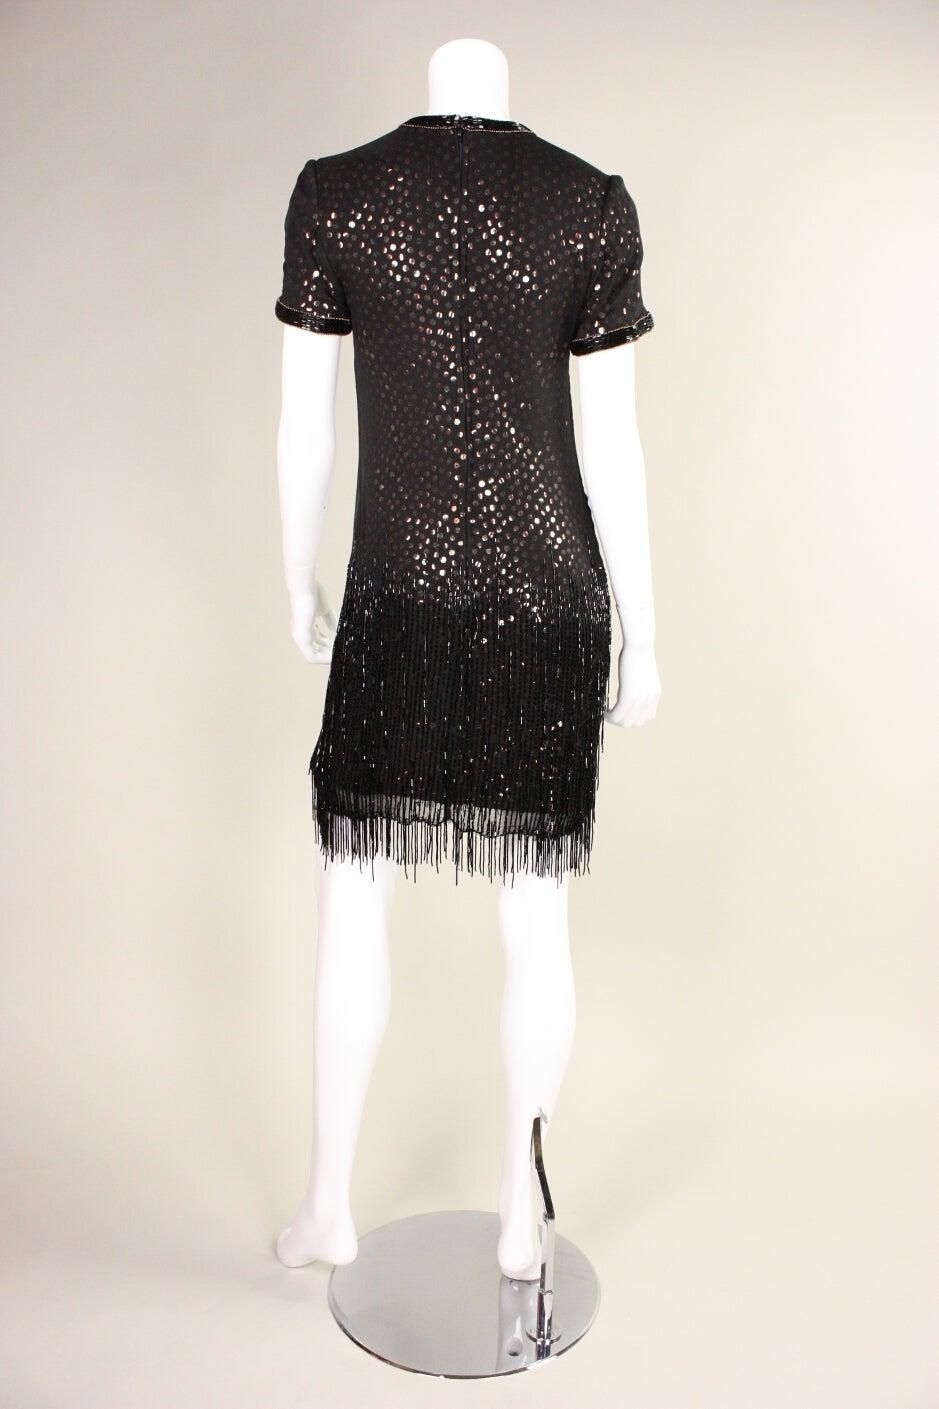 1980s Bob Mackie Sequined Dress with Beaded Fringe 5